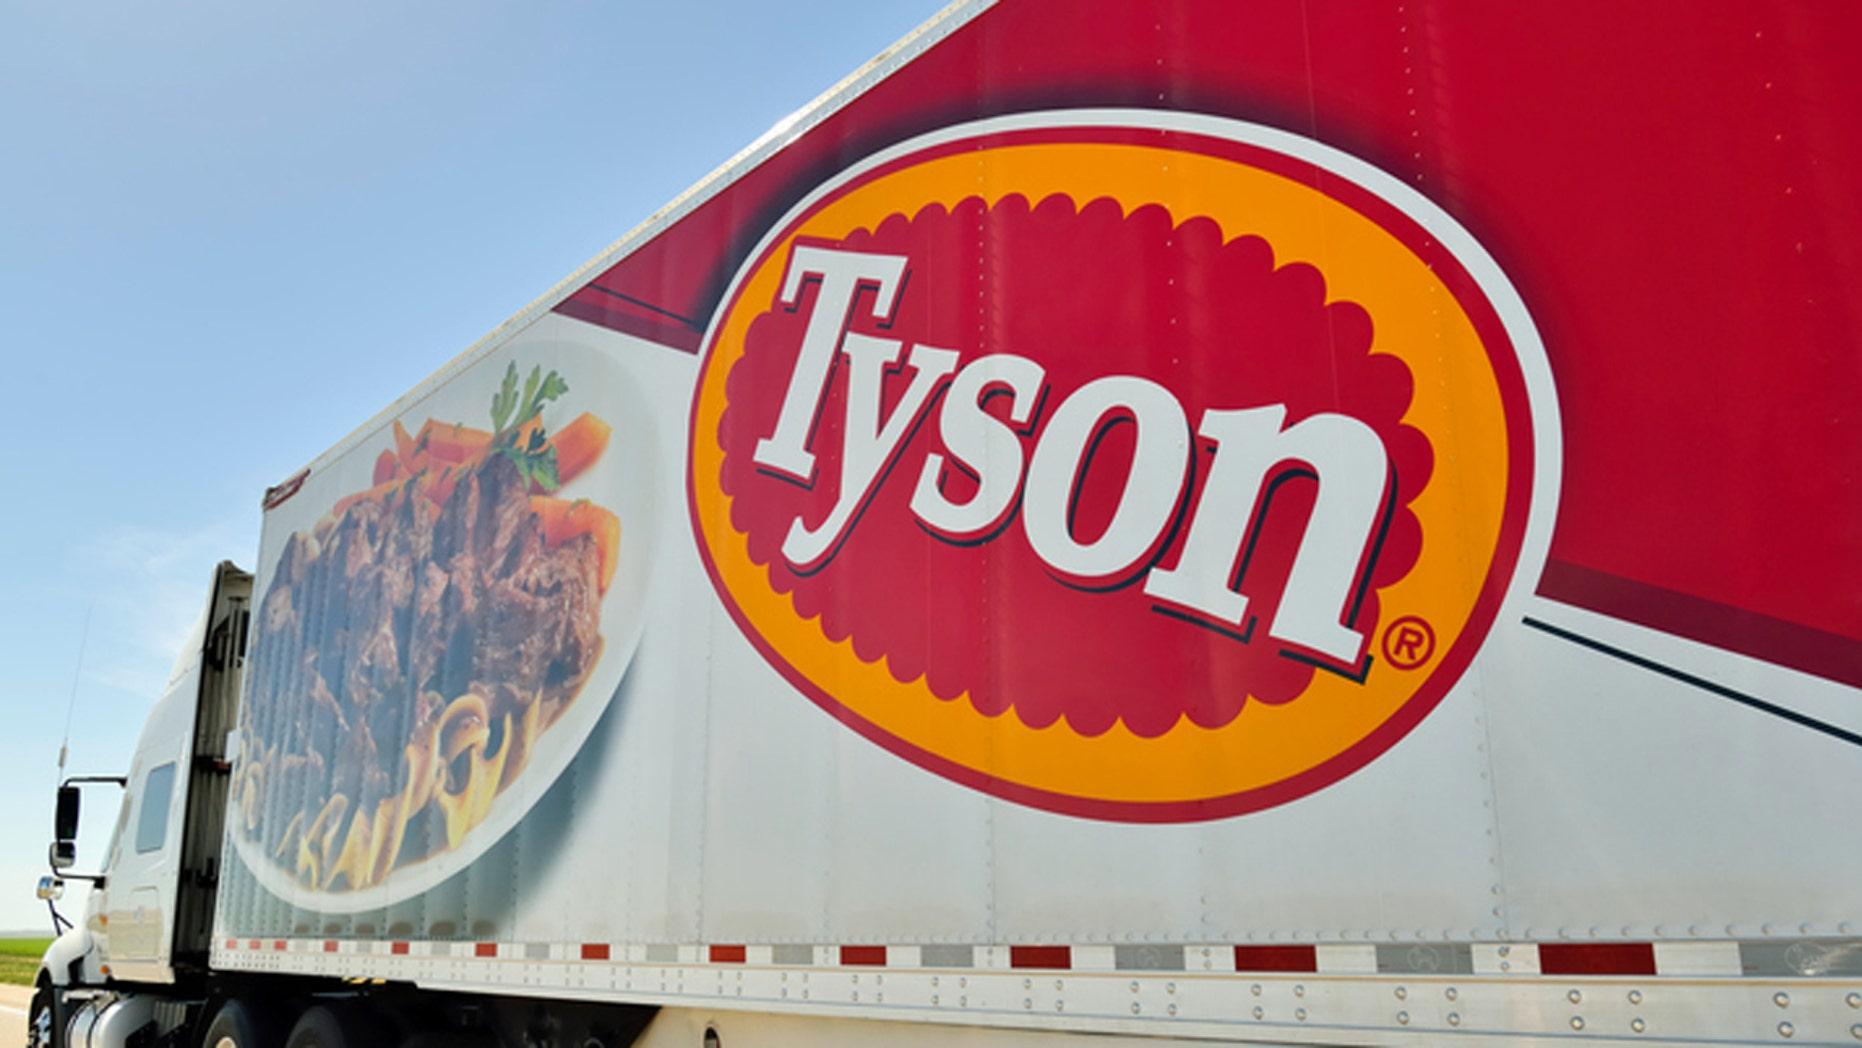 North Platte, Nebraska, USA - June 28, 2013: A Tyson Foods semi truck on Interstate 80 near North Platte. Tyson Foods is a multi national food processor.